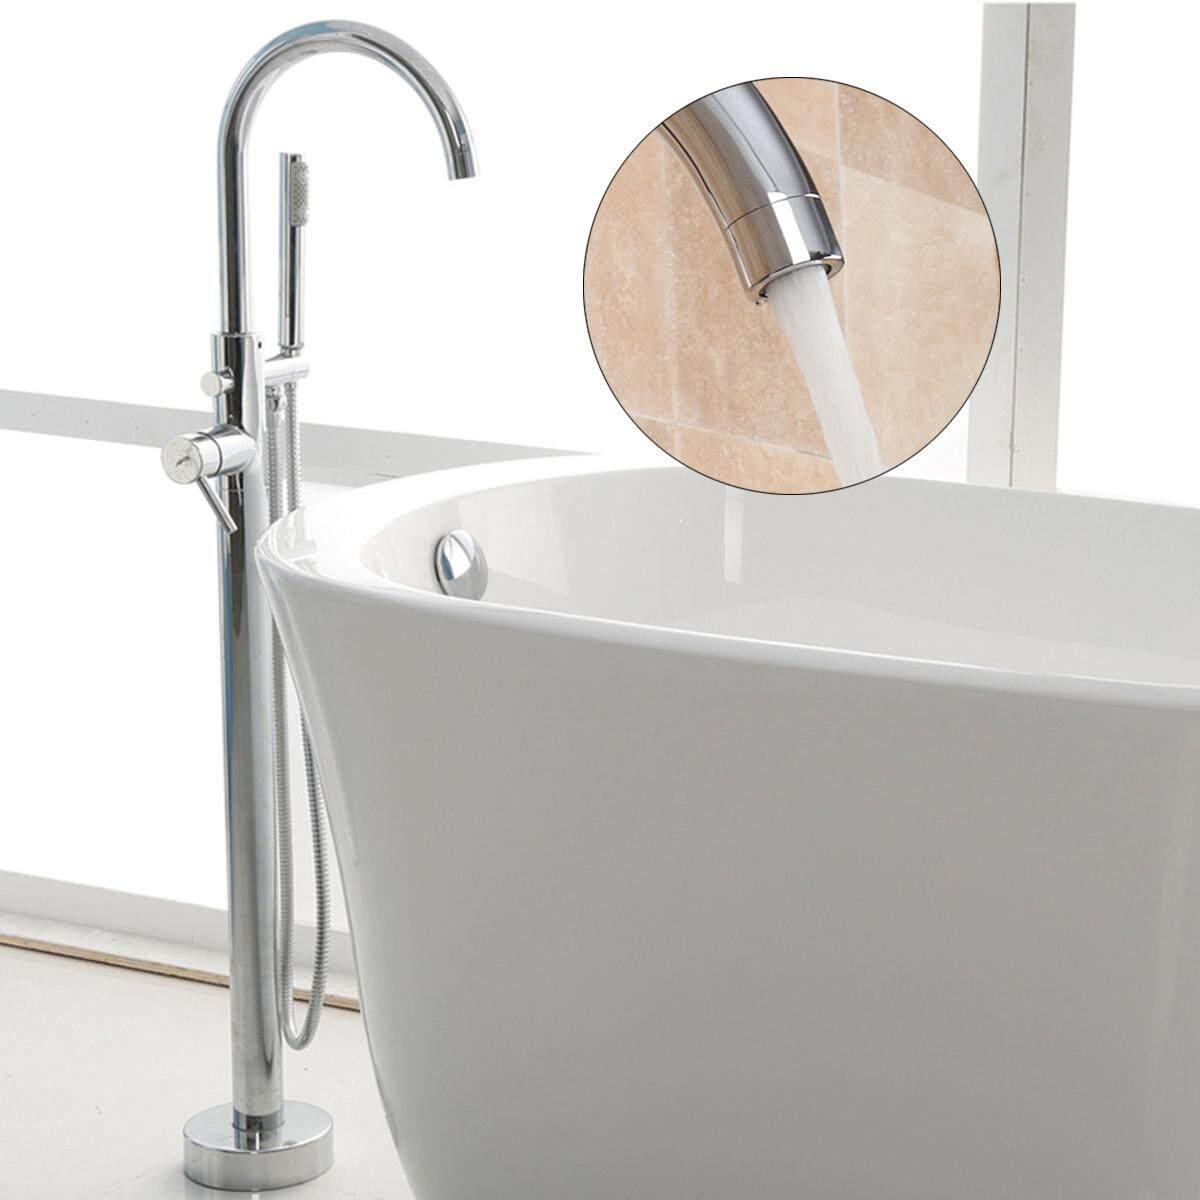 4 Style Retro Bathroom Free Standing Floor Mounted Bath Tub Hand Held Shower Head Tap